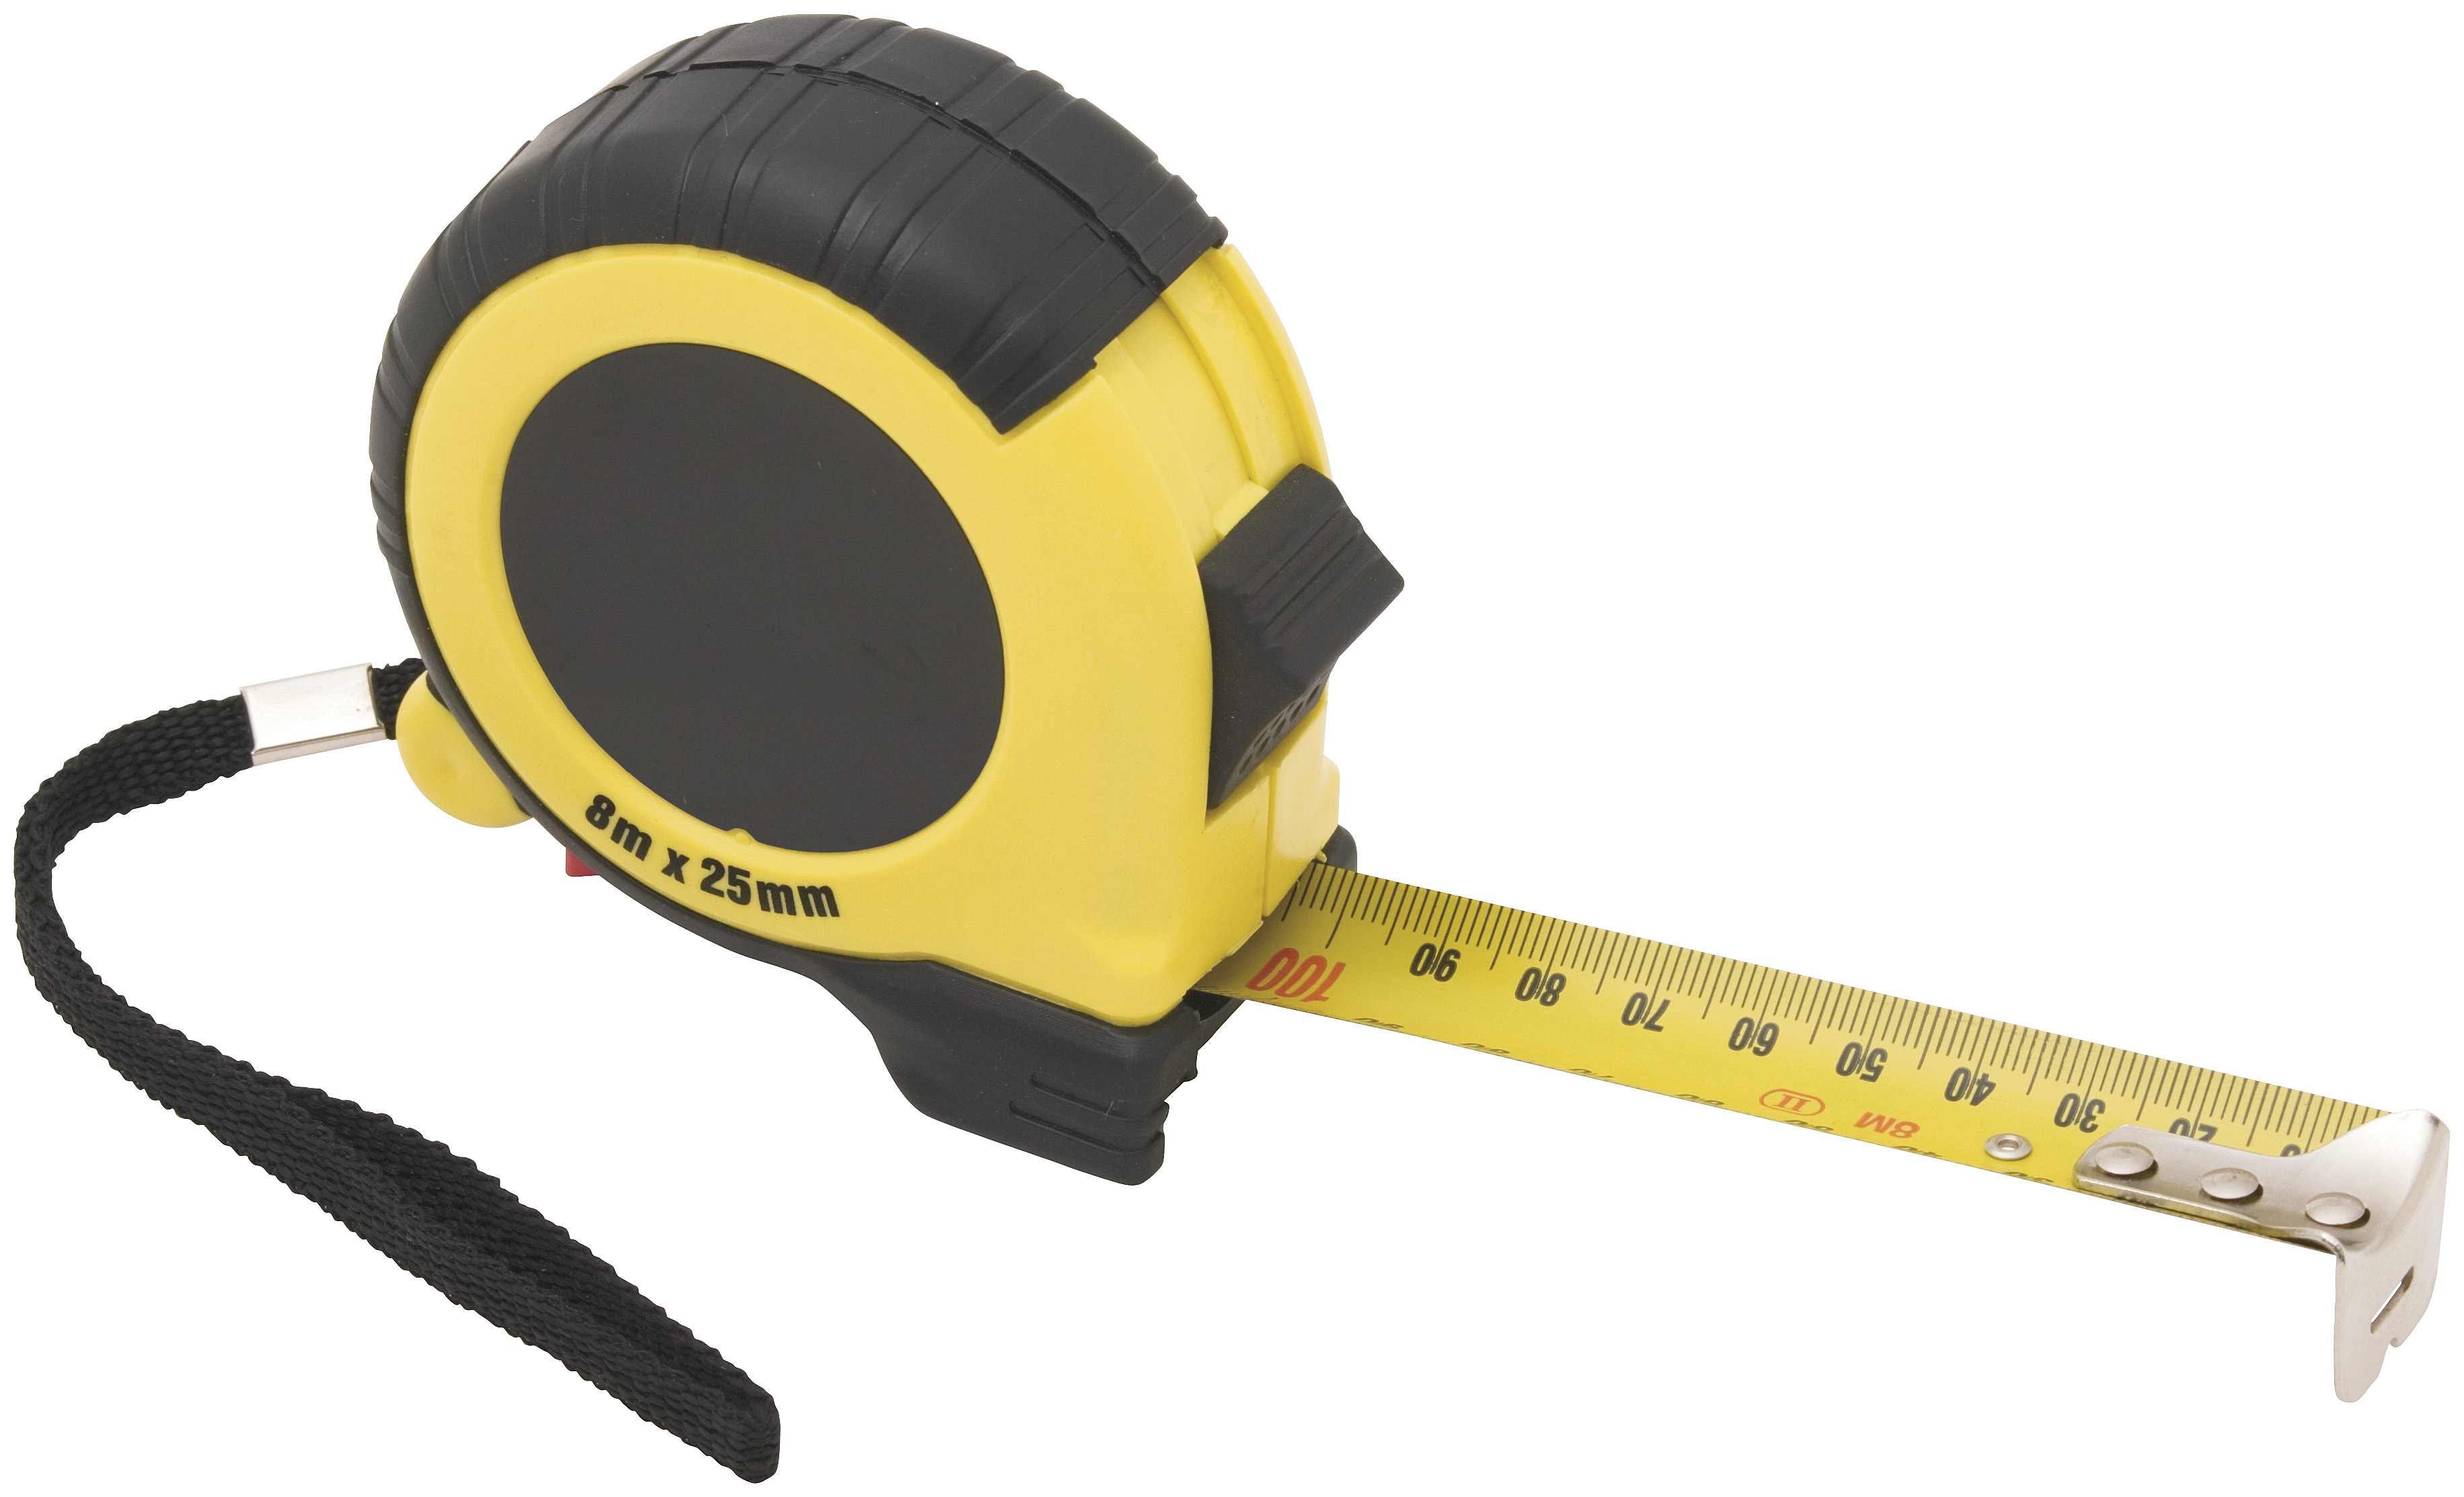 Multimeter Clip Art : Meter clipart free download best on